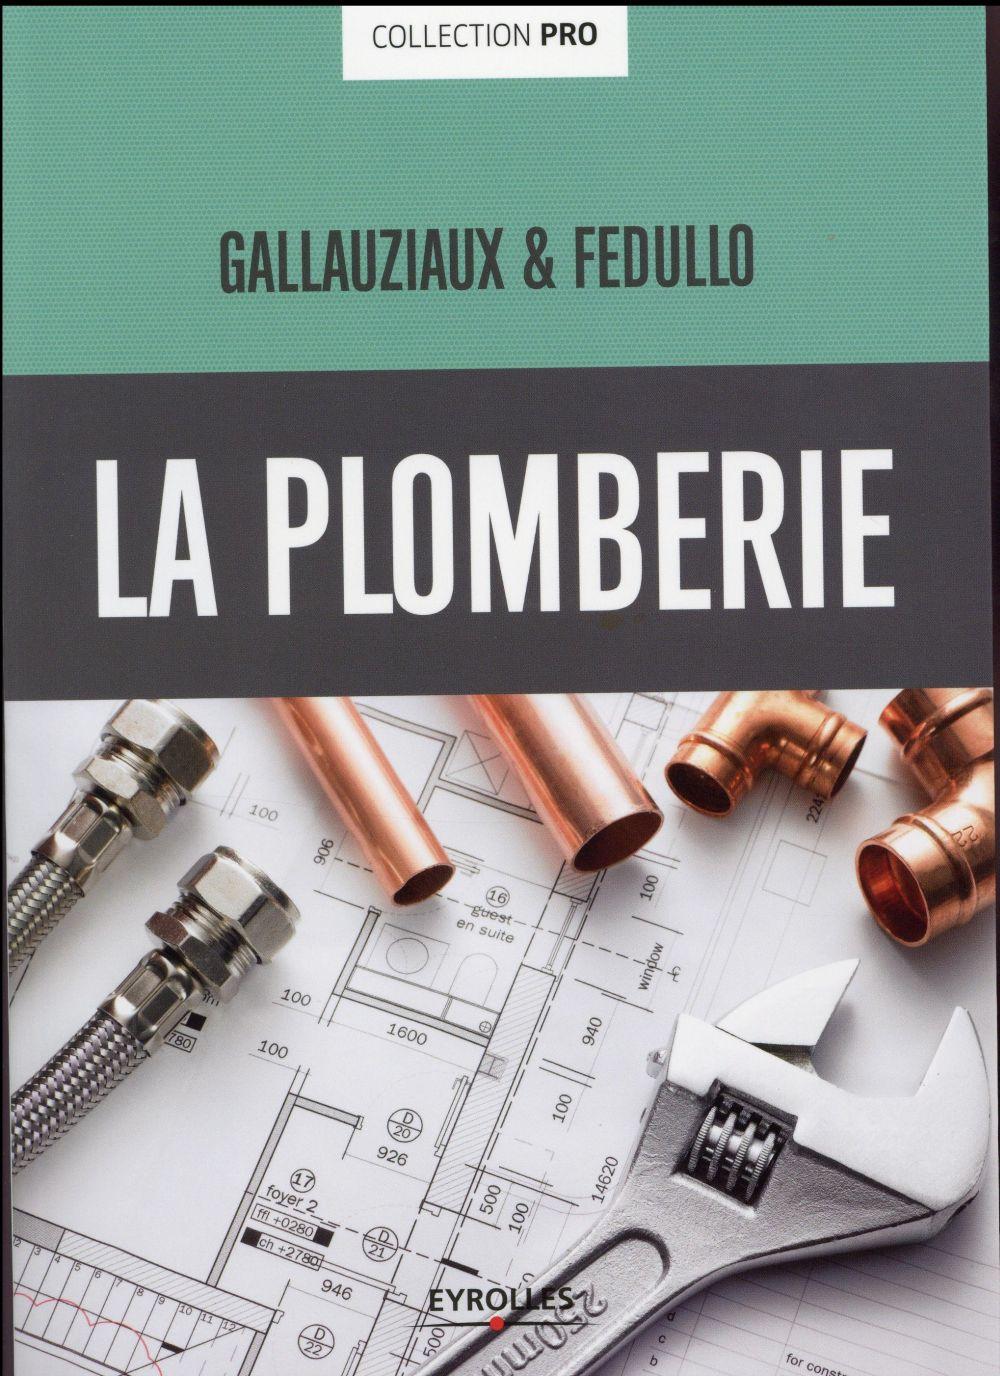 LA PLOMBERIE GALLAUZIAUX FEDULLO Eyrolles